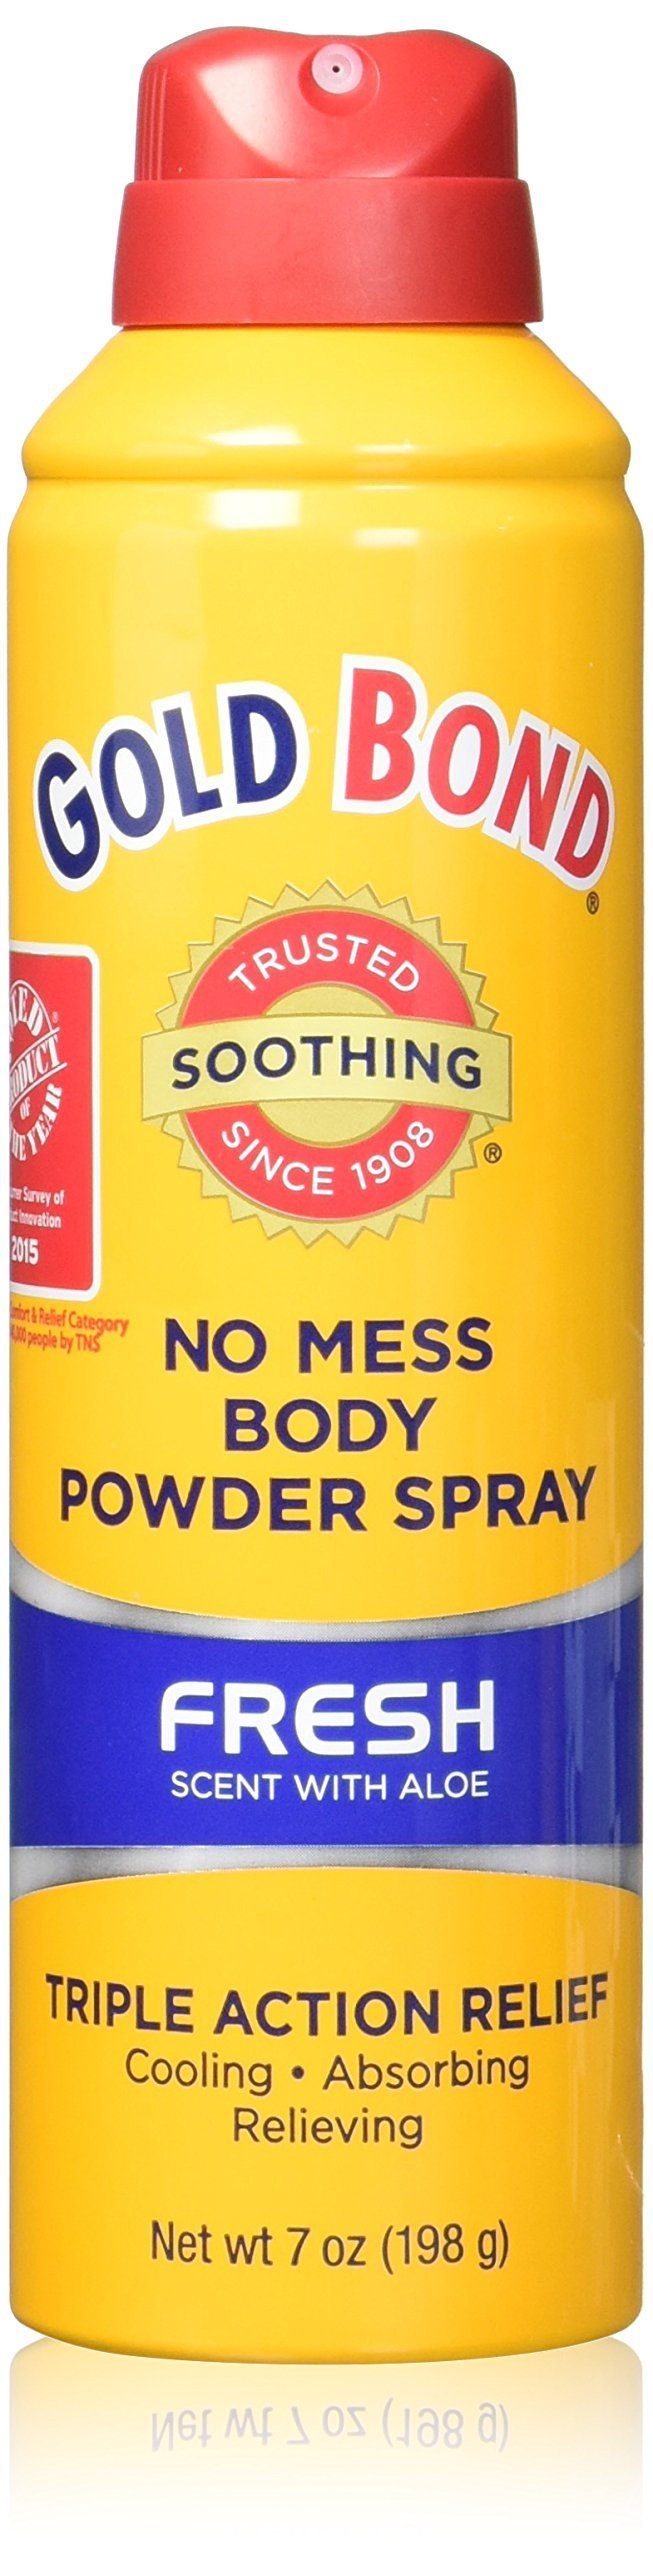 Gold Bond No Mess Spray Powder, Fresh Scent/Aloe, 7 Ounce, 2 Count